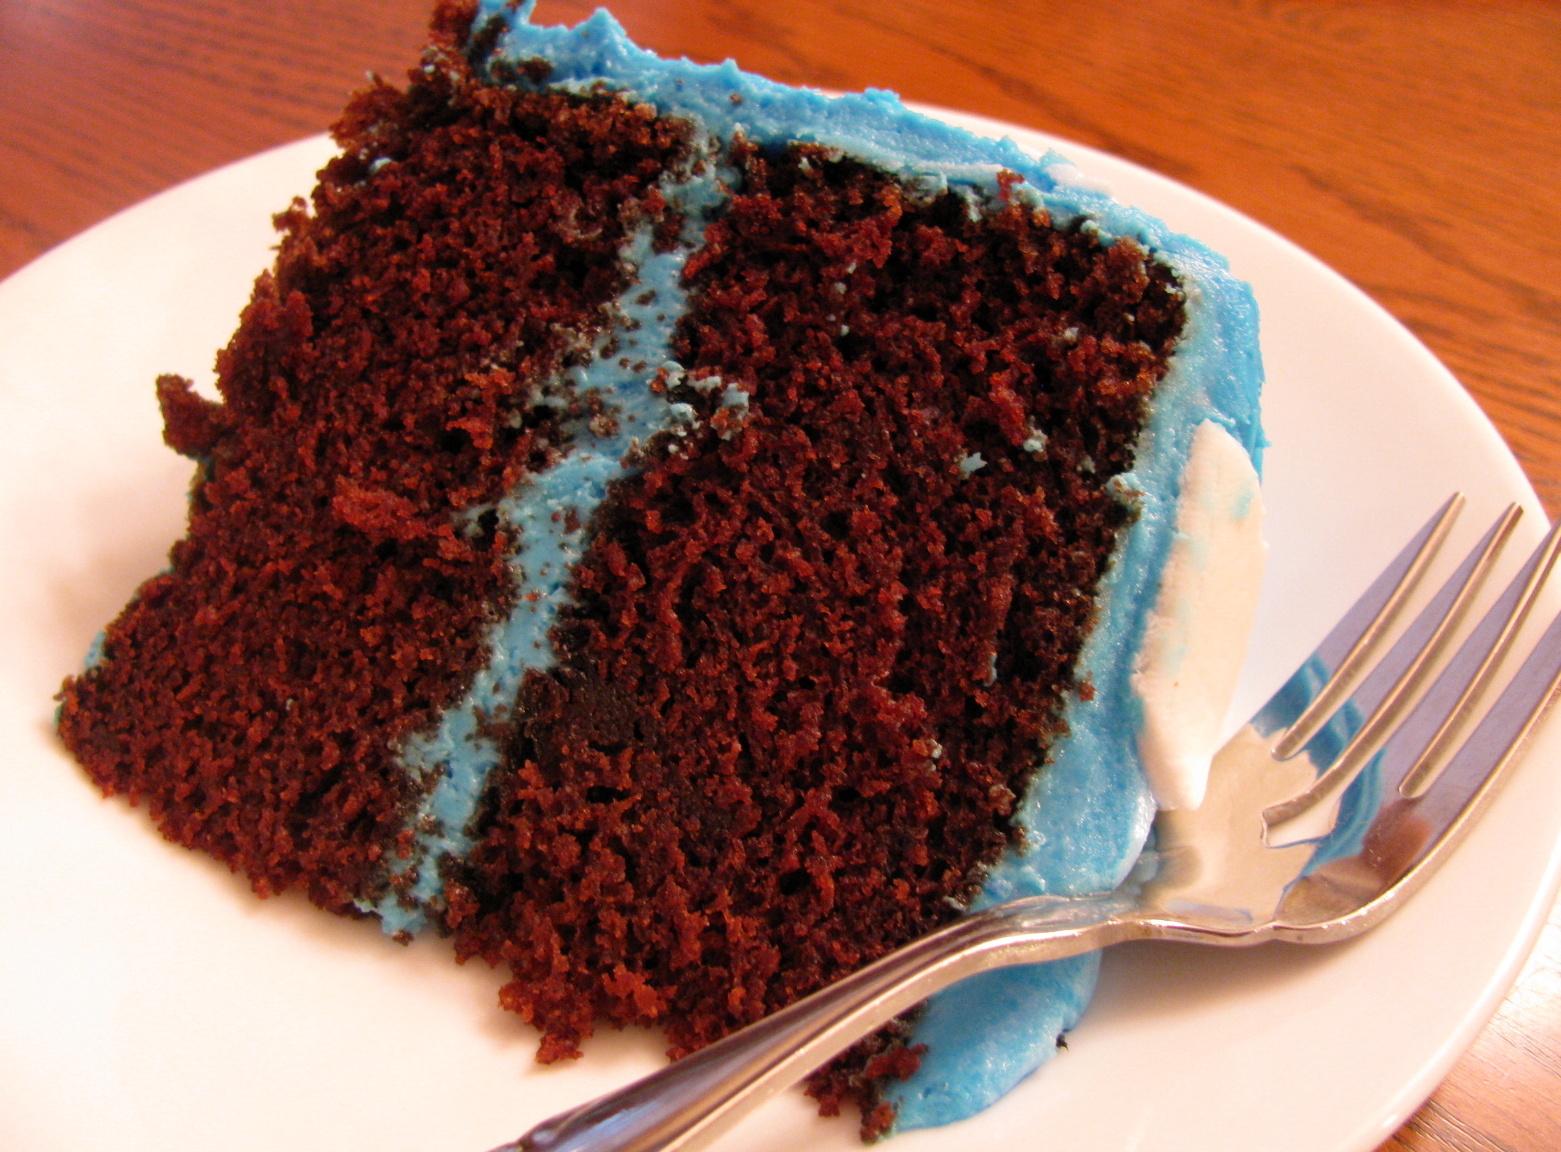 Cake Recipes Dairy Free: Egg-Free & Dairy-Free Chocolate Cake